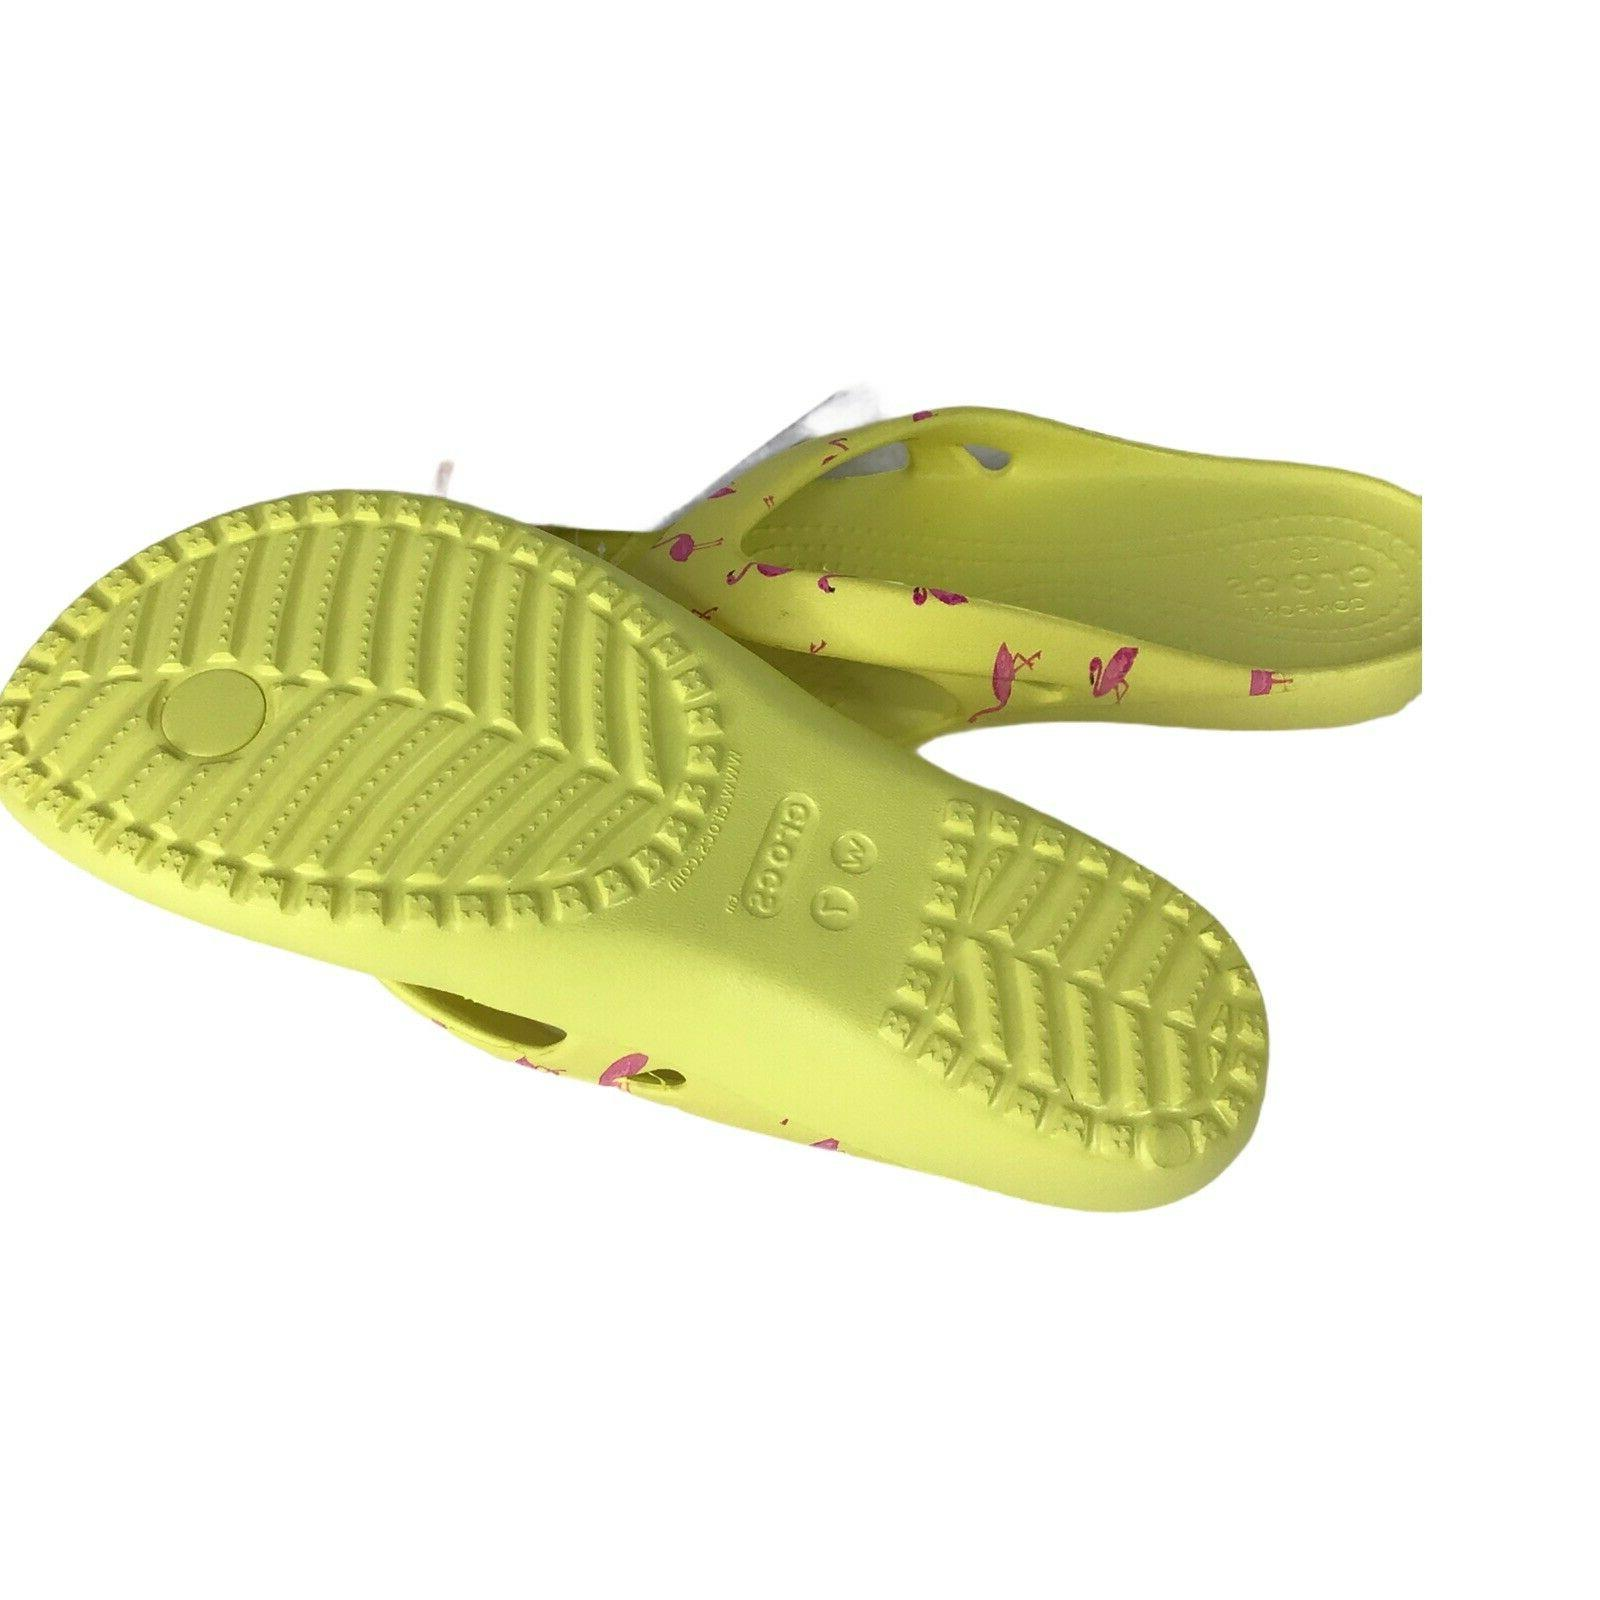 Crocs Graphic Flip w/ Pink